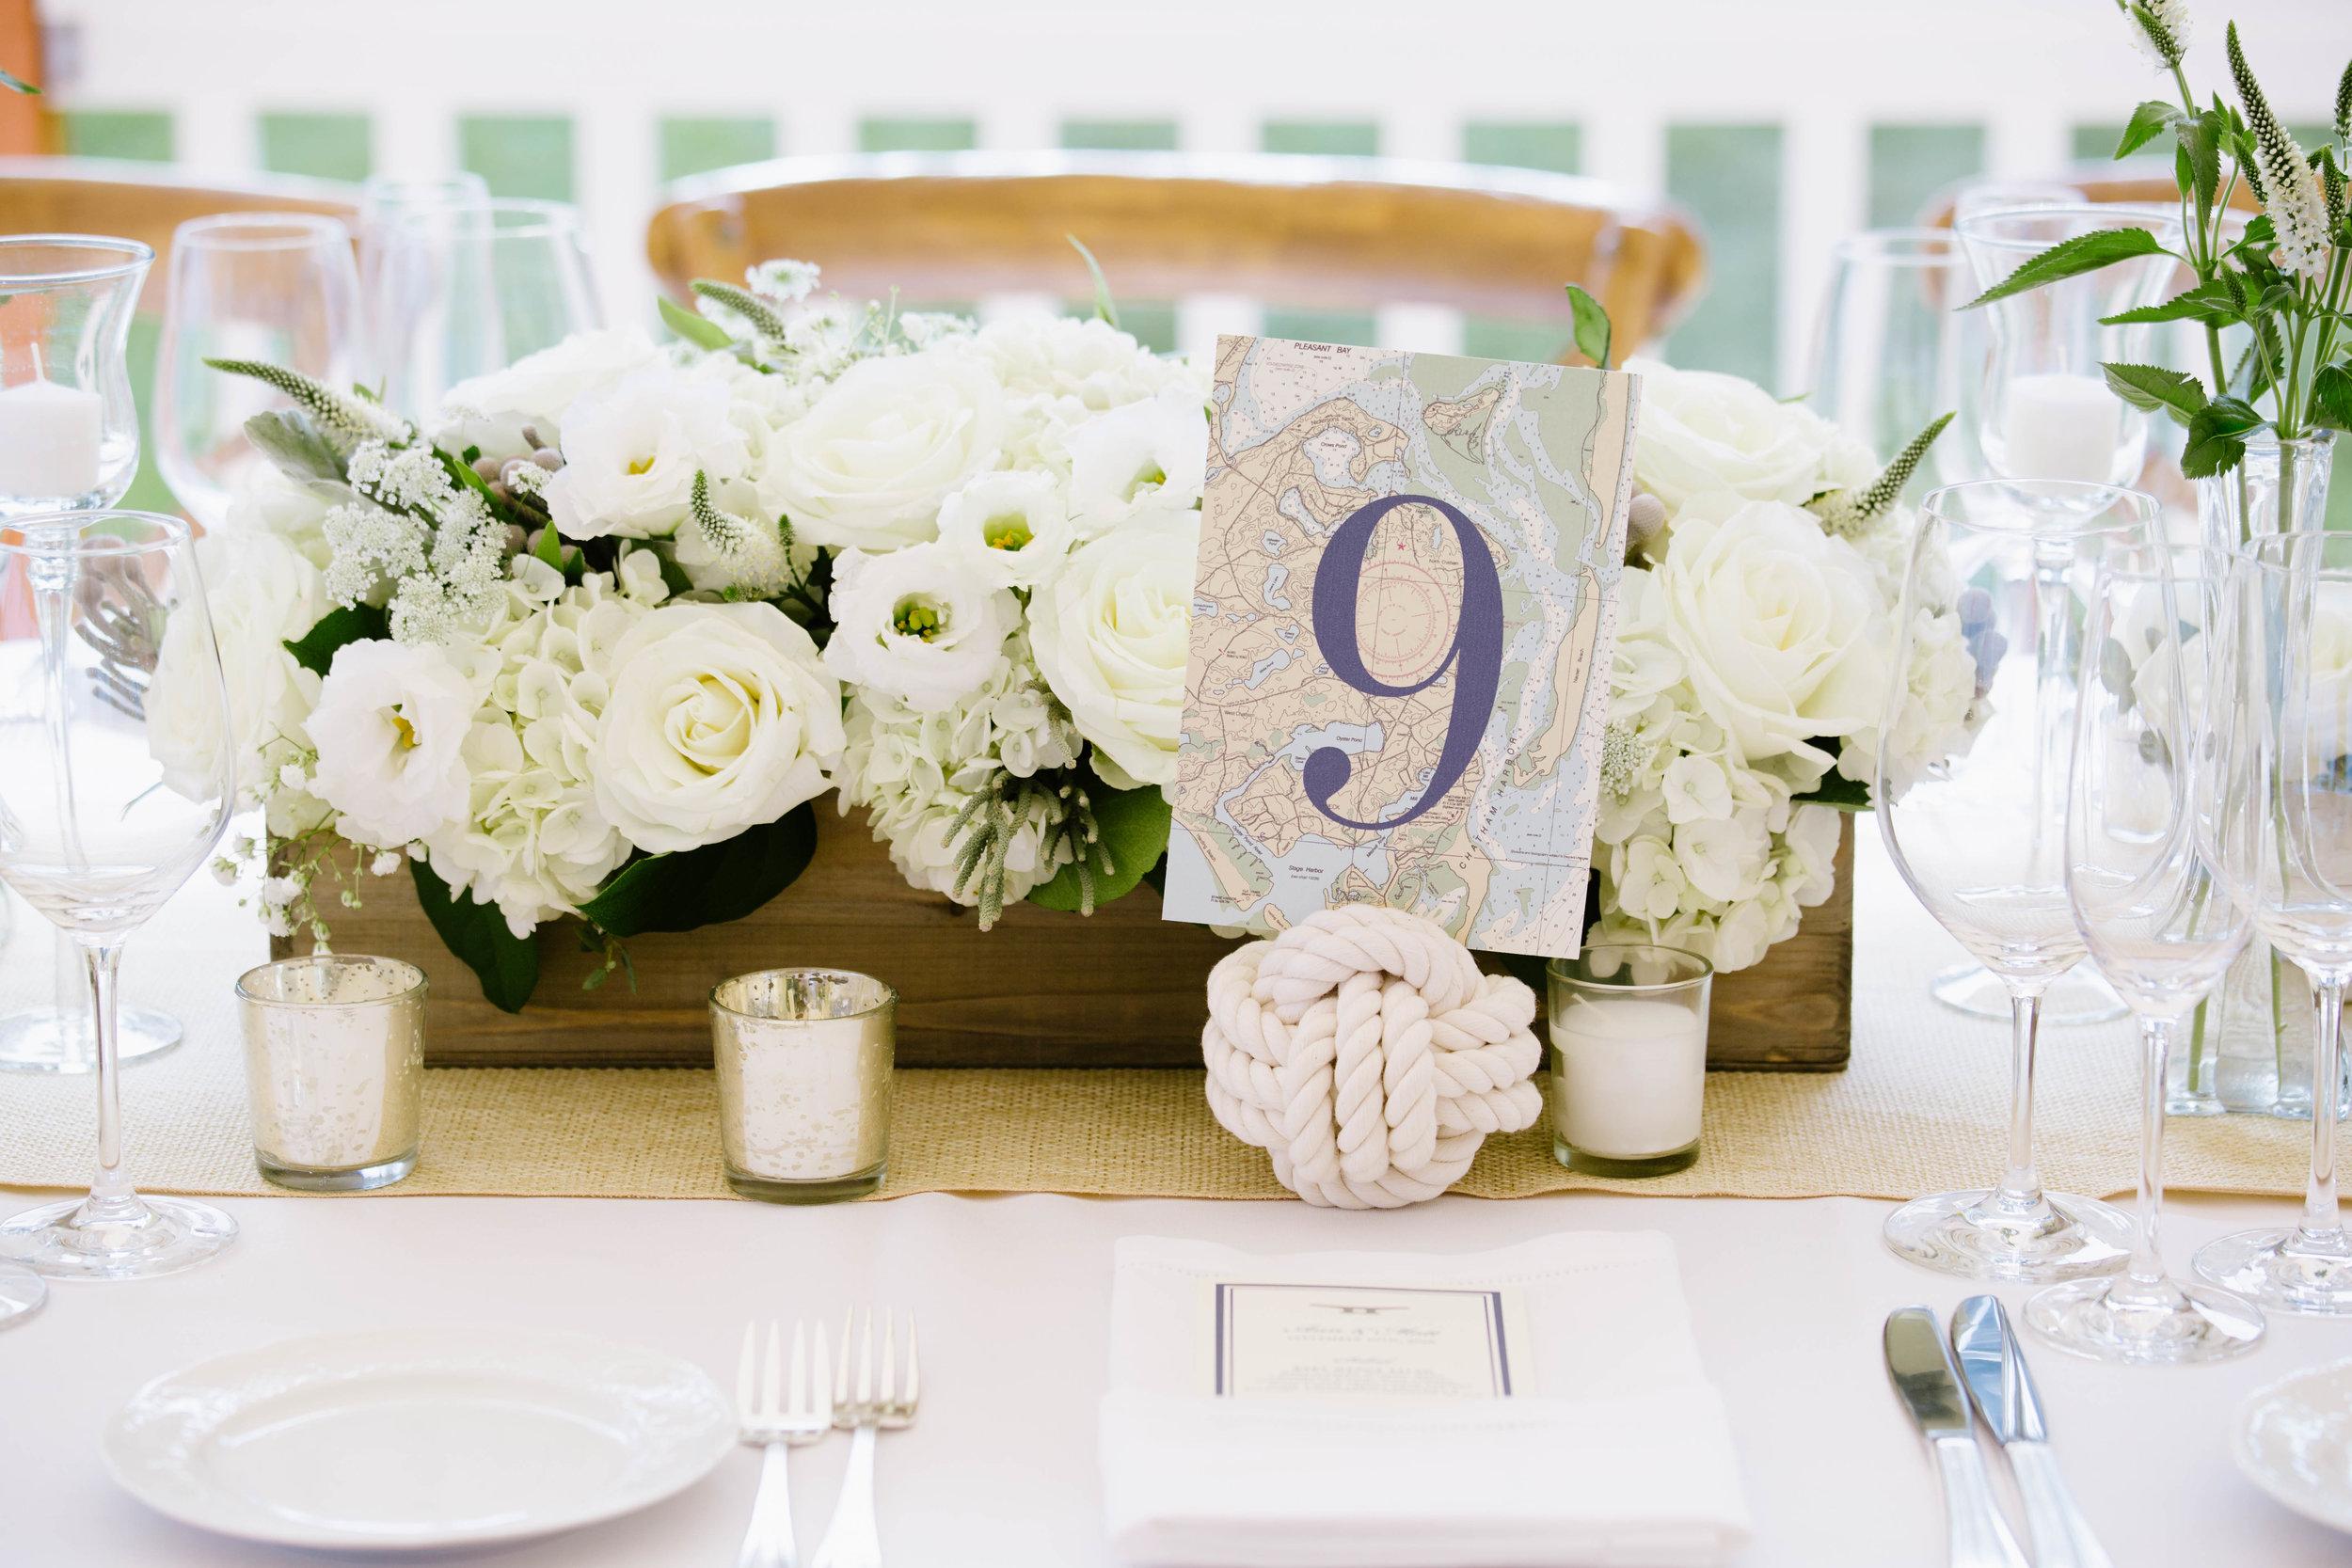 Candid-Wedding-Photography012.jpg